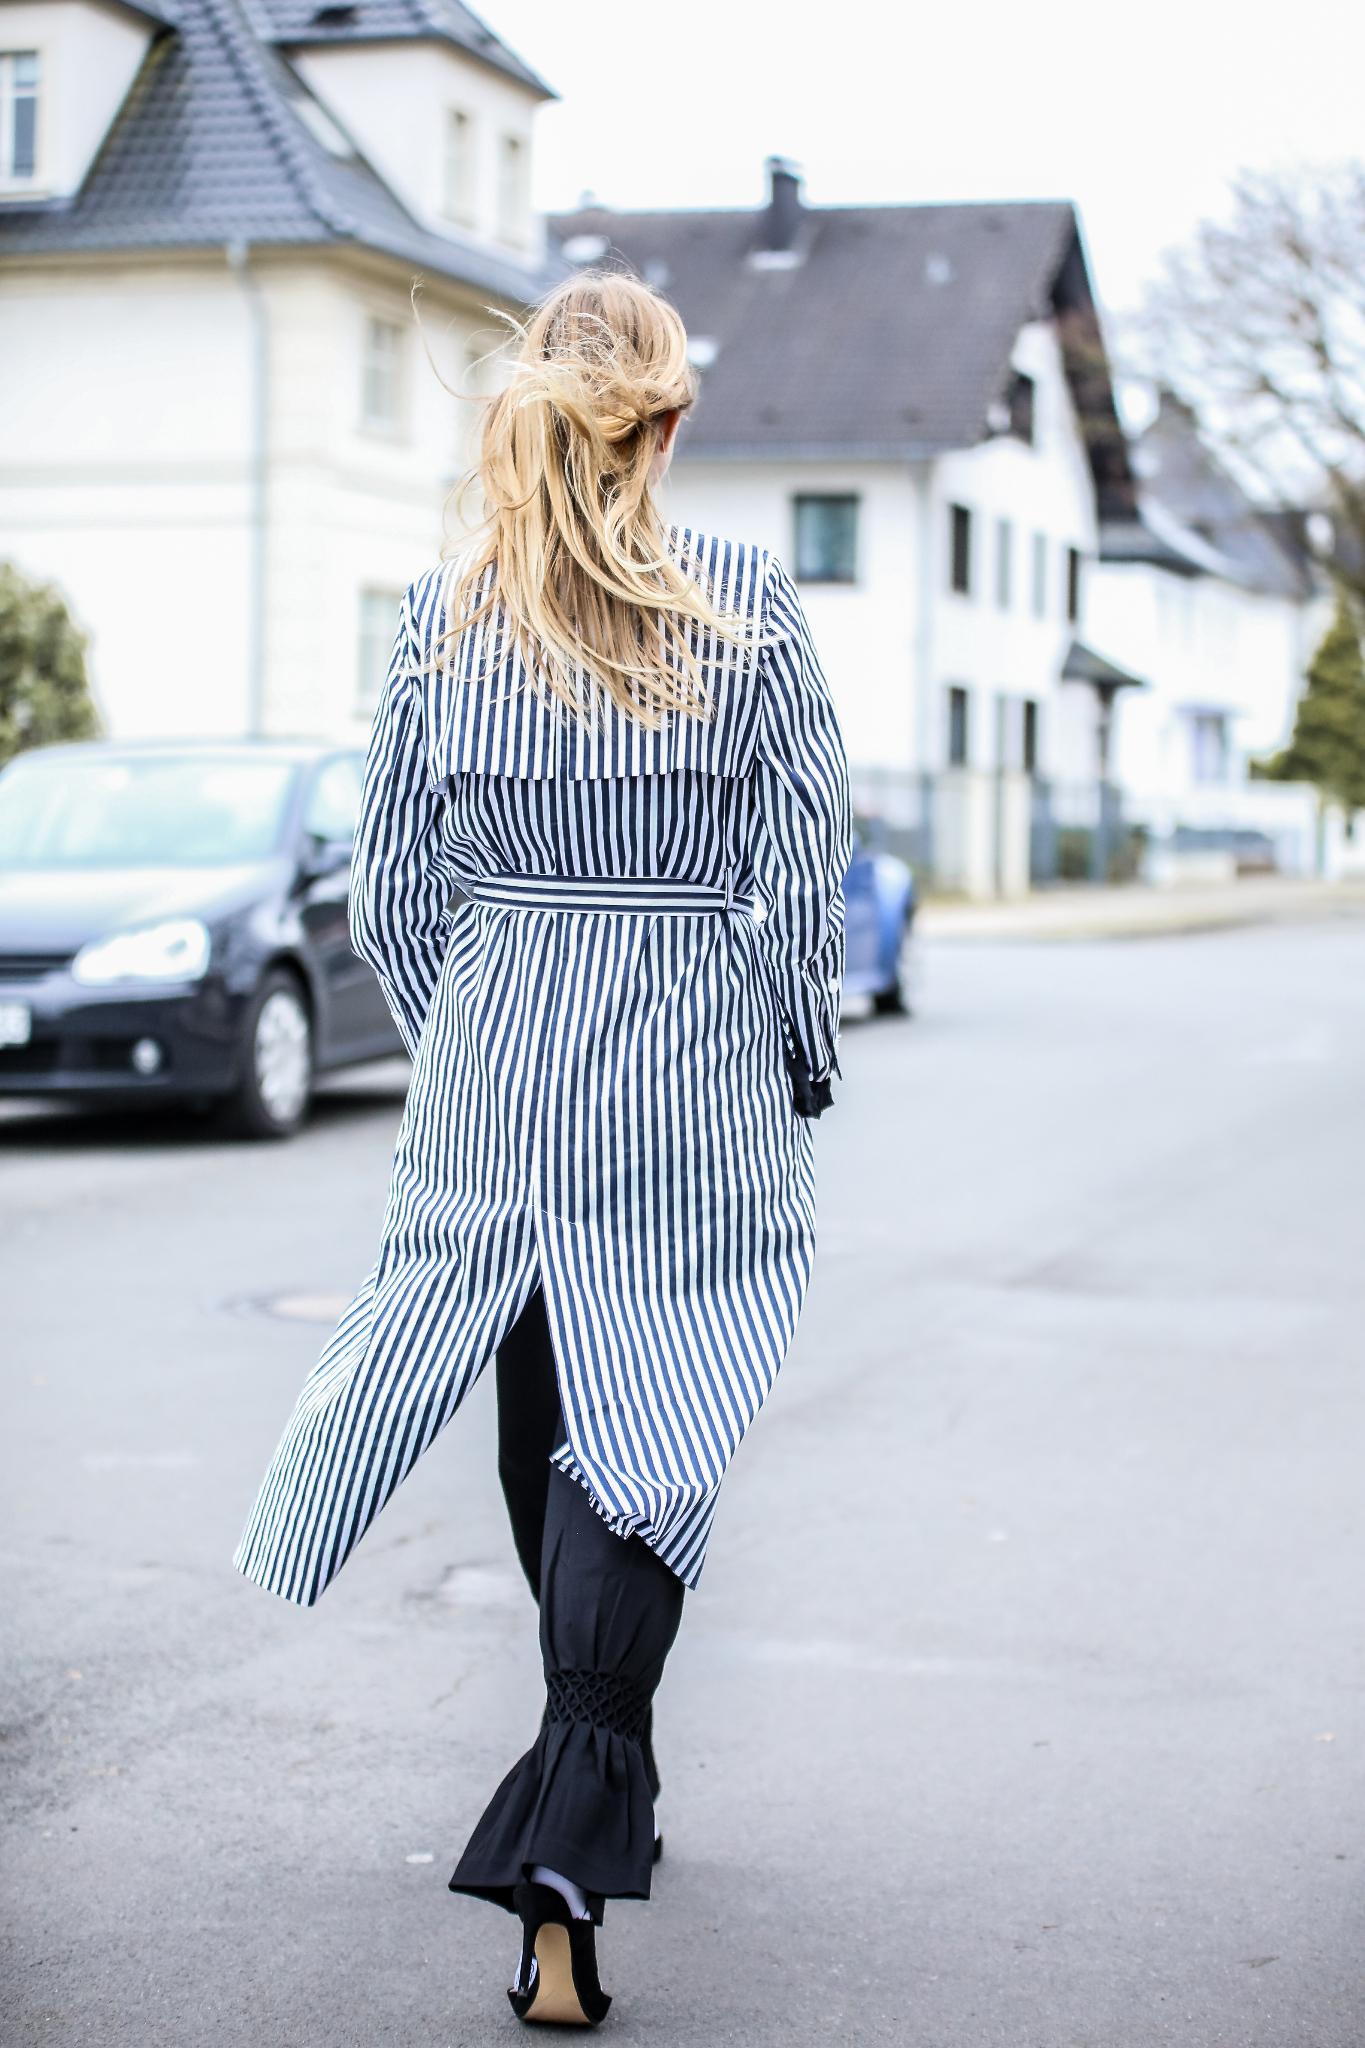 MOD-by-Monique-Fashion-Looks-Striped-Coat-Big-Volants-11